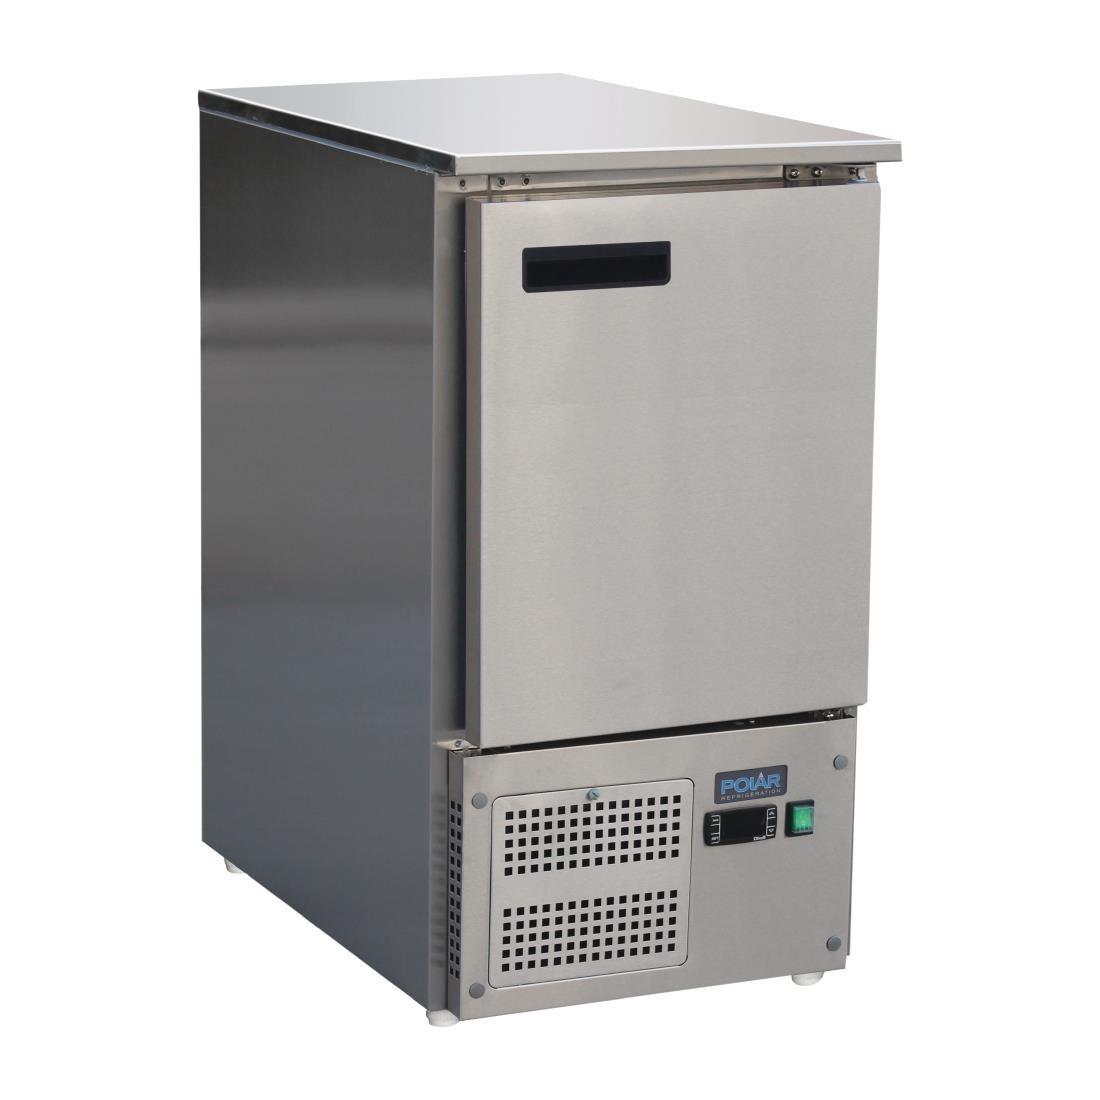 Polar FA443 G-Series Saladette Freezer Single Door